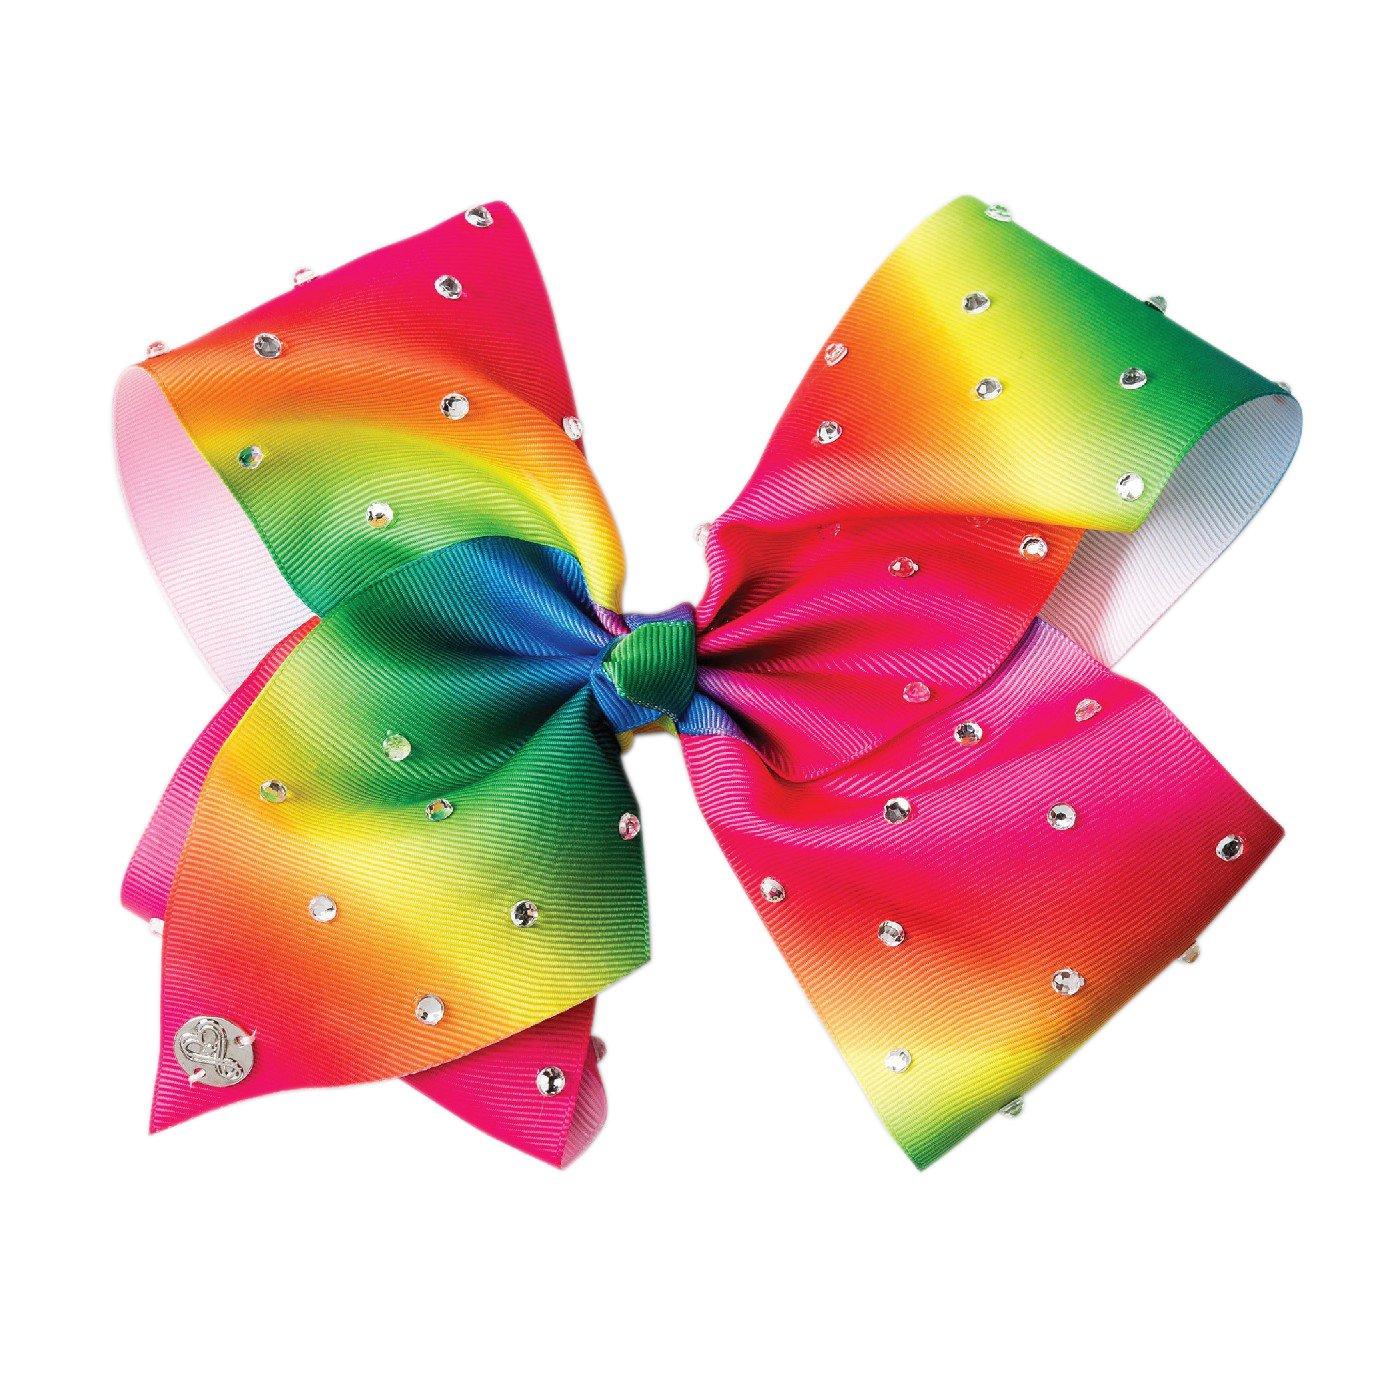 Nickelodeon JoJo Siwa Giant Rhinestone Bow Hair Clip, Rainbow, OSFM